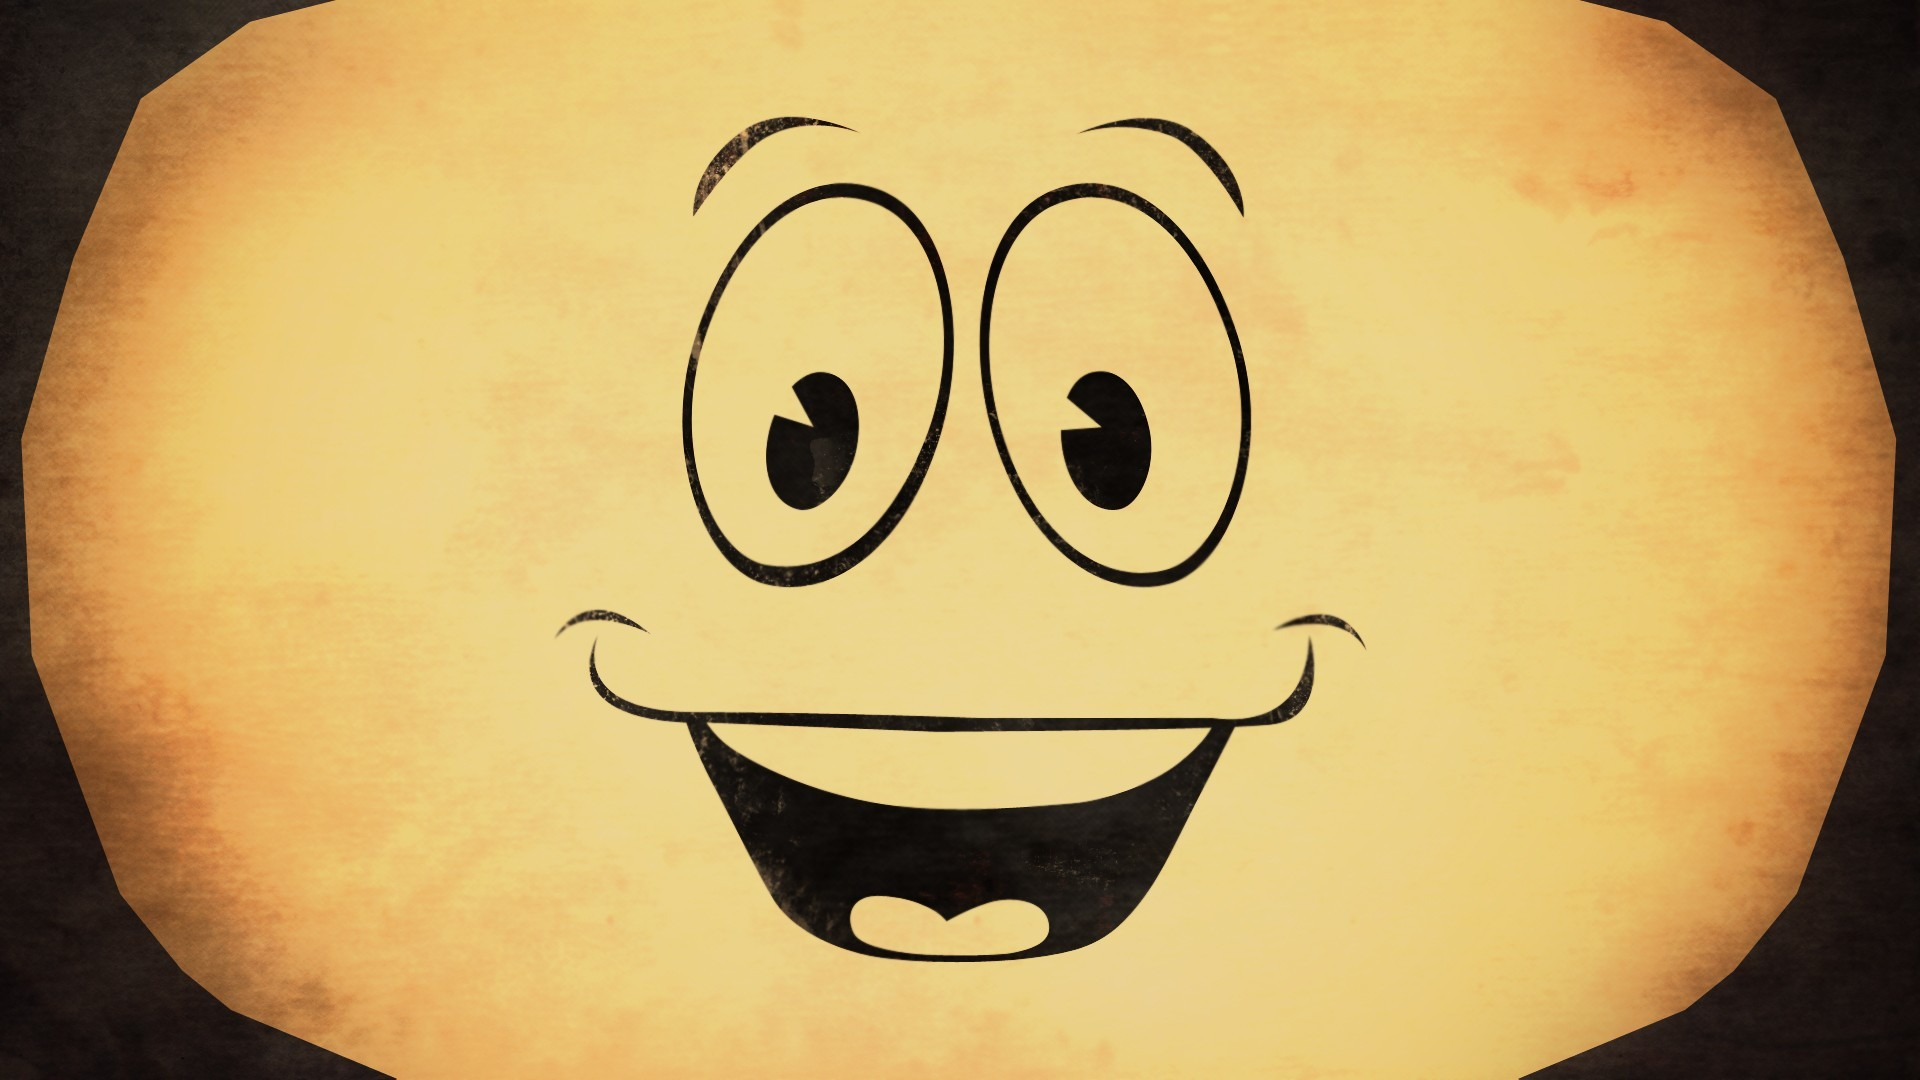 Smile Humor Wallpapers WallpapersInk Smile More Wallpaper, Live Smile More  Wallpapers, RCC Smile 1920×1080